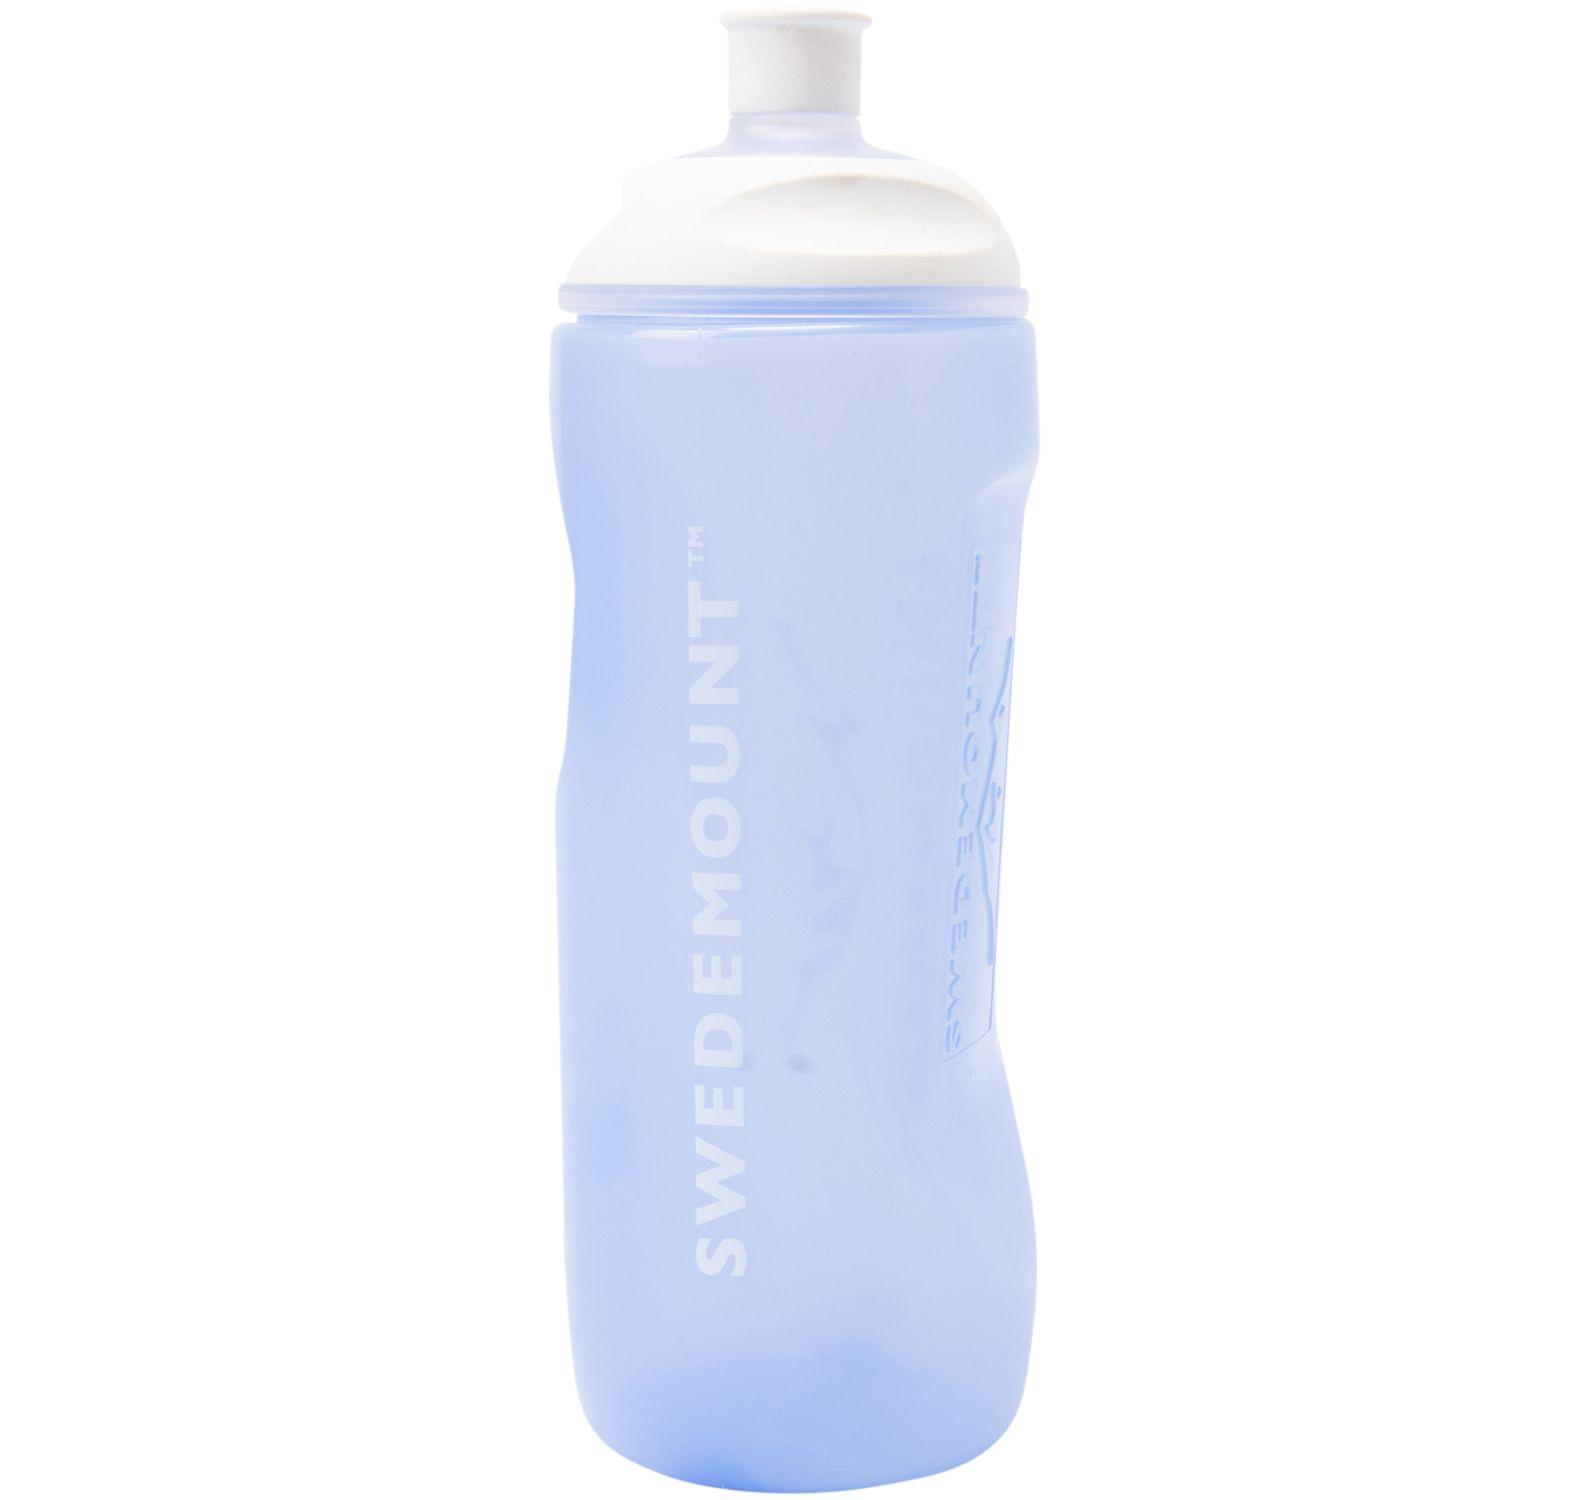 Swedemount Plastic Bottle, Lt Blue, Onesize, Swedemount